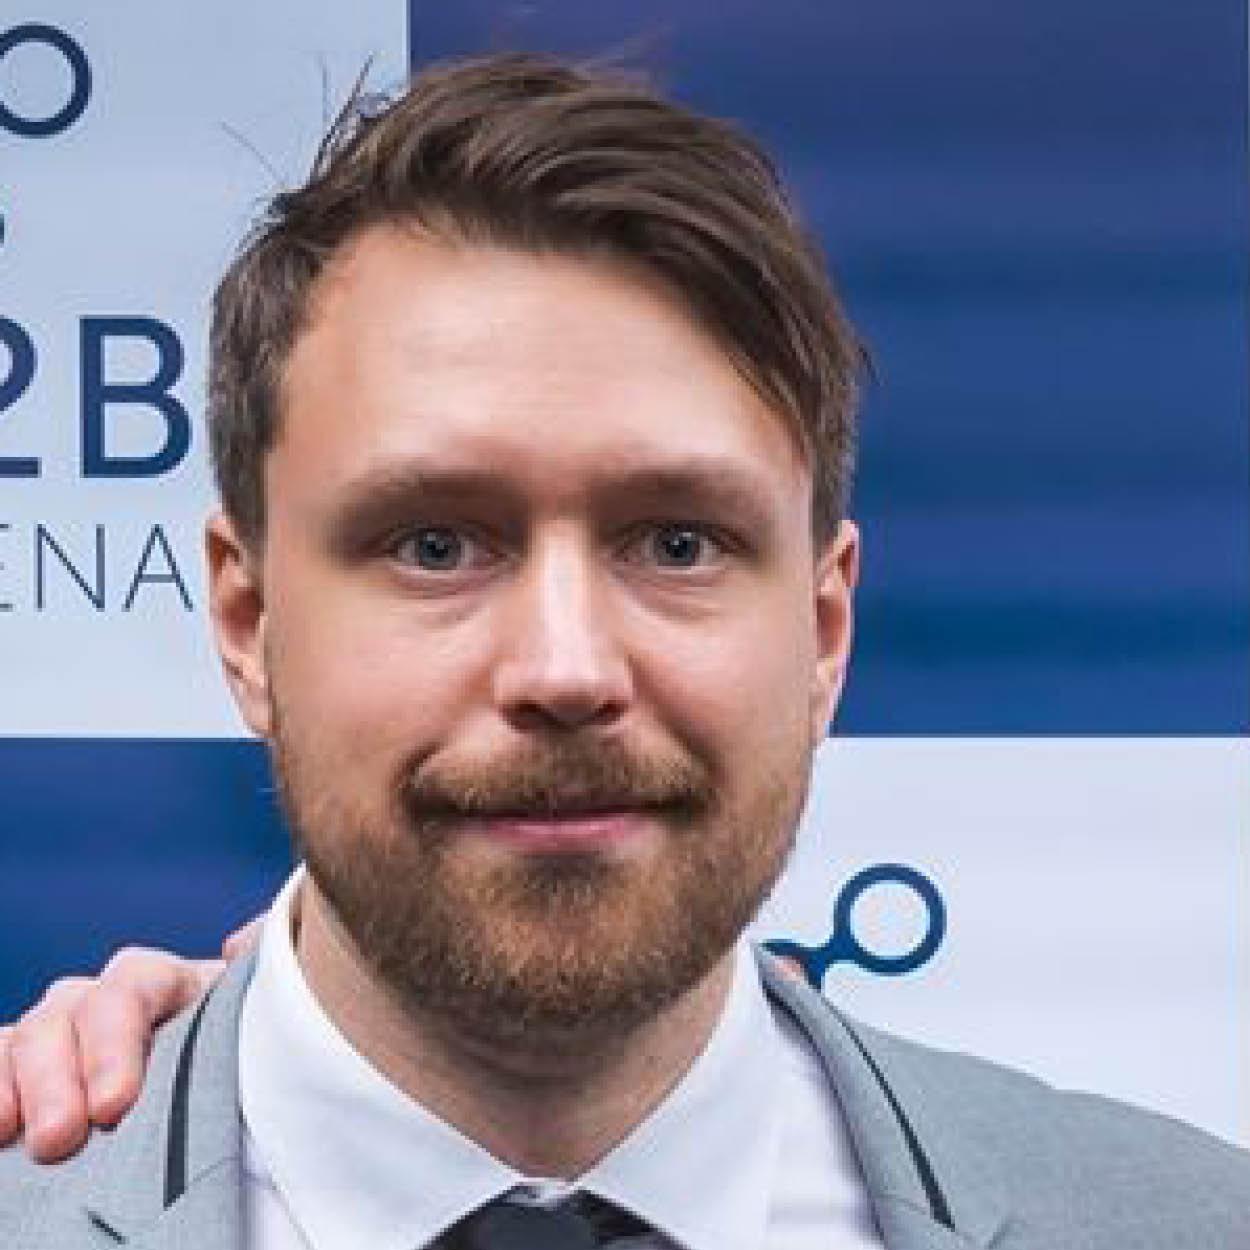 Aleksander Barstad Rødseth i Reolteknikk